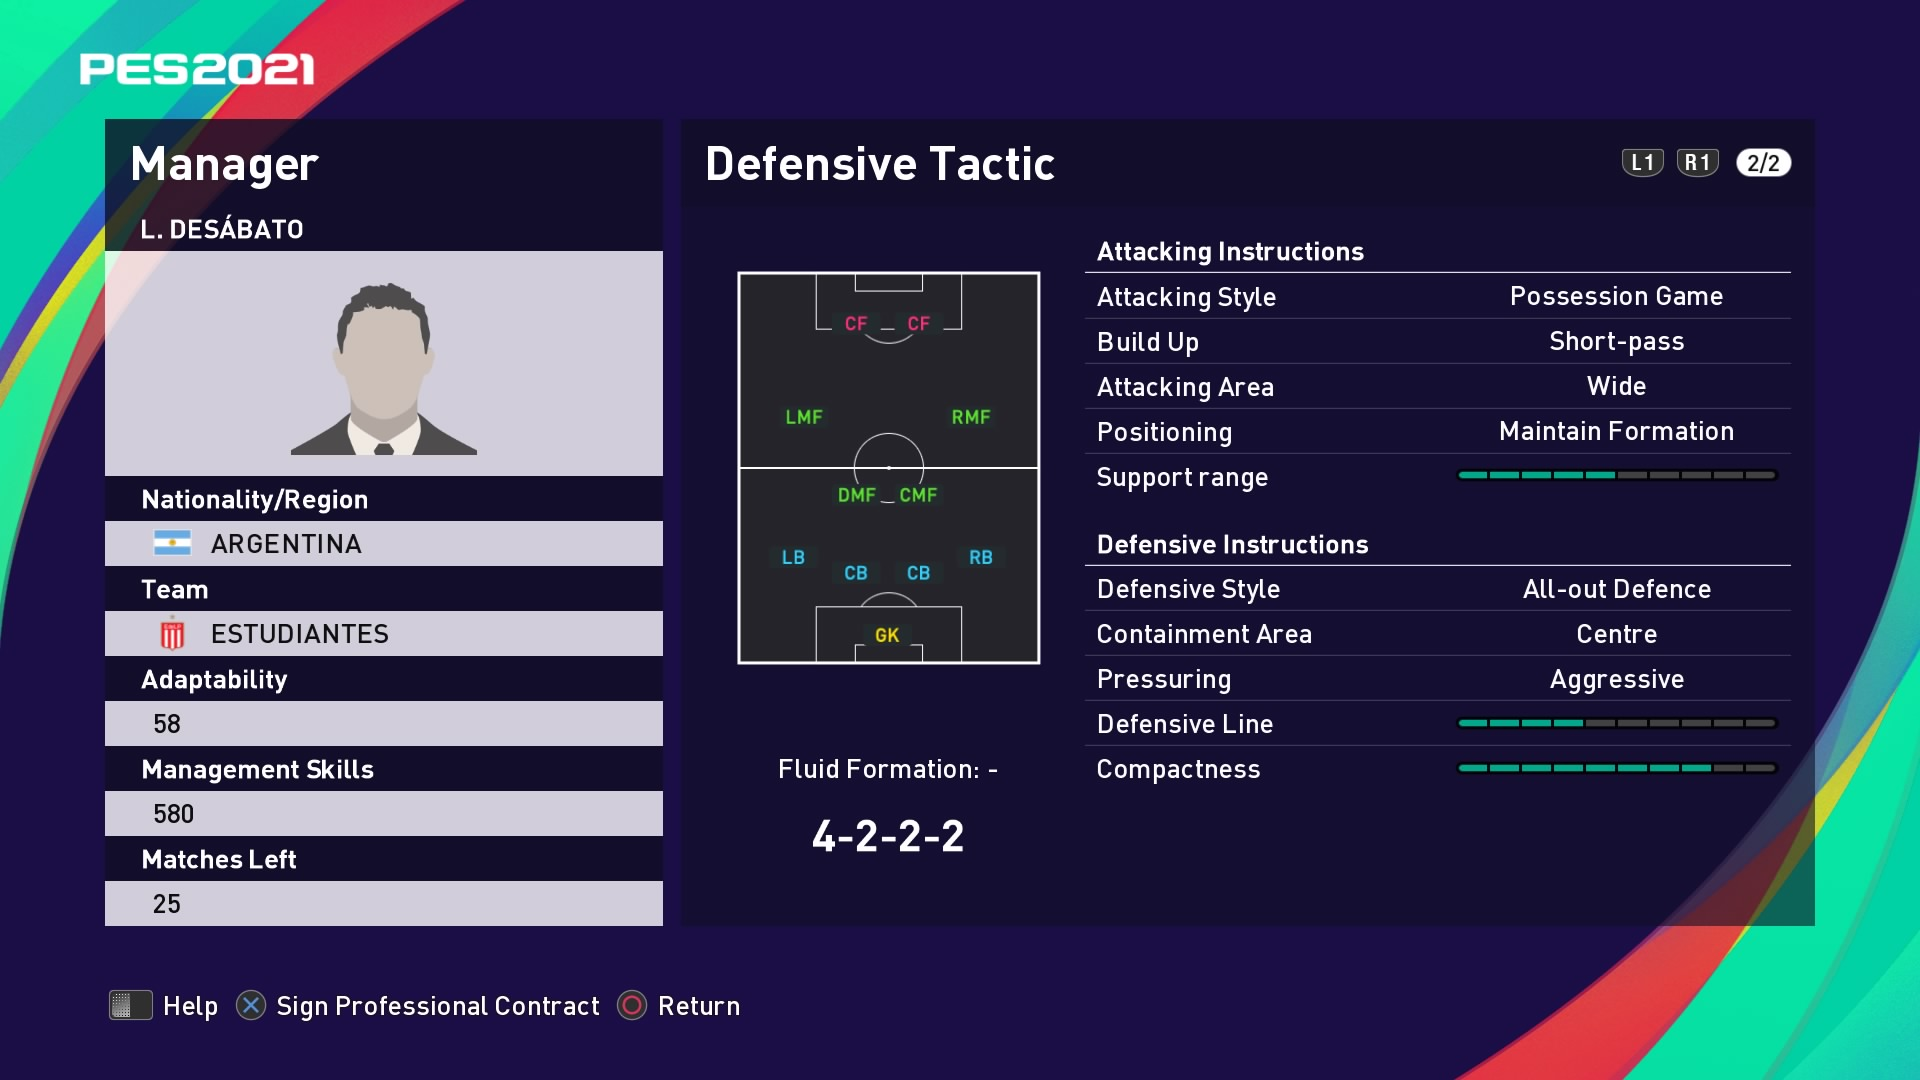 L. Desábato (Leandro Desábato) Defensive Tactic in PES 2021 myClub